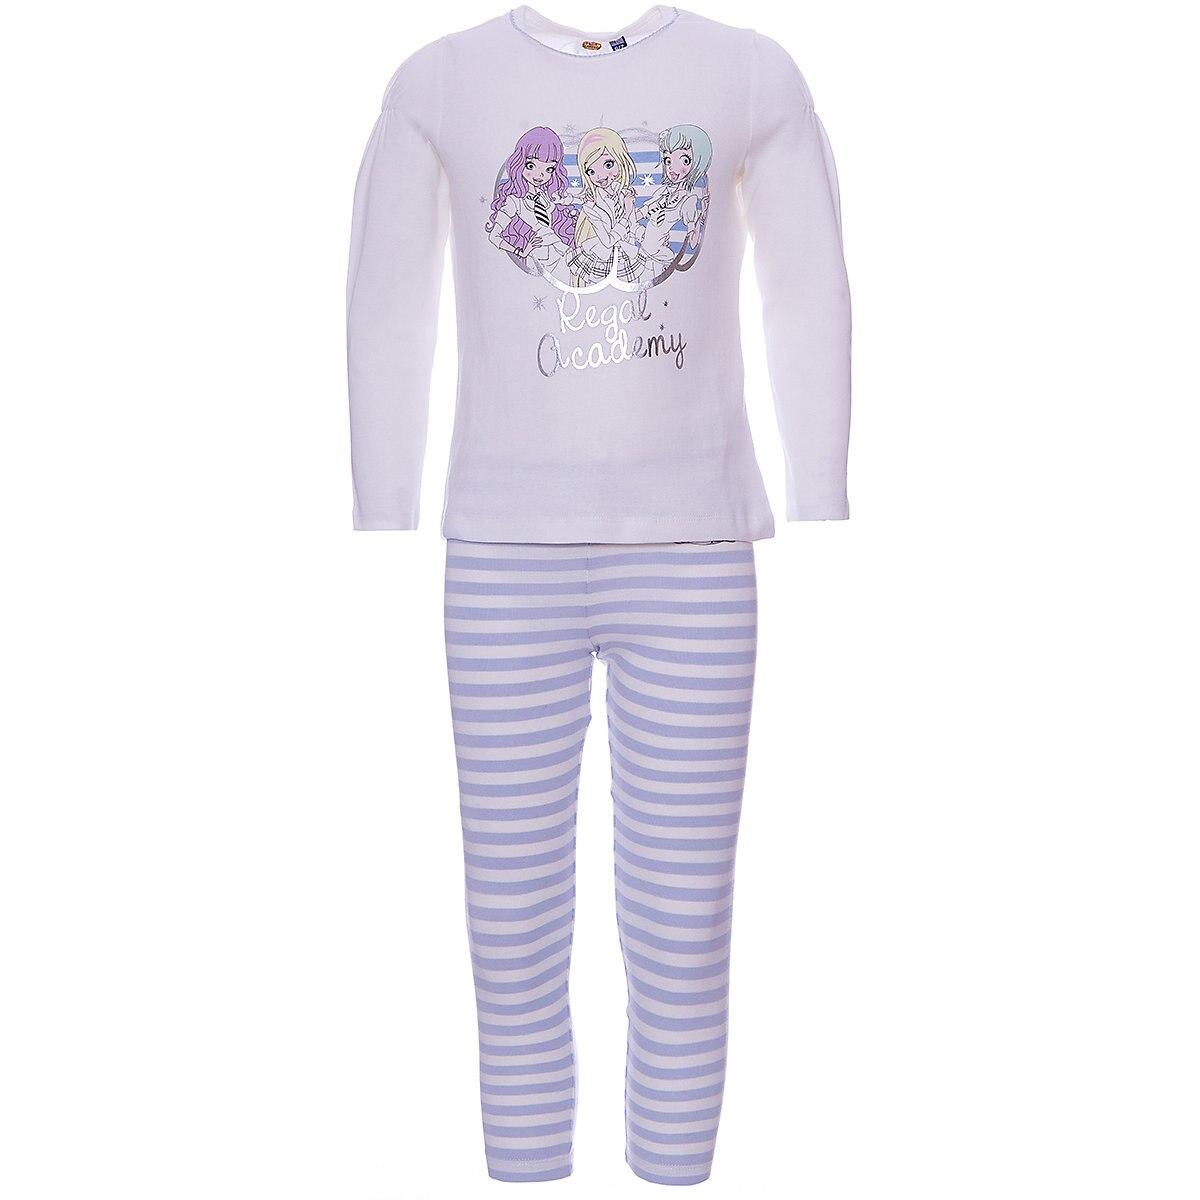 ORIGINAL MARINES Pajama Sets 9500903 Cotton Girls childrens clothing Sleepwear Robe parrot print cami pajama set with robe